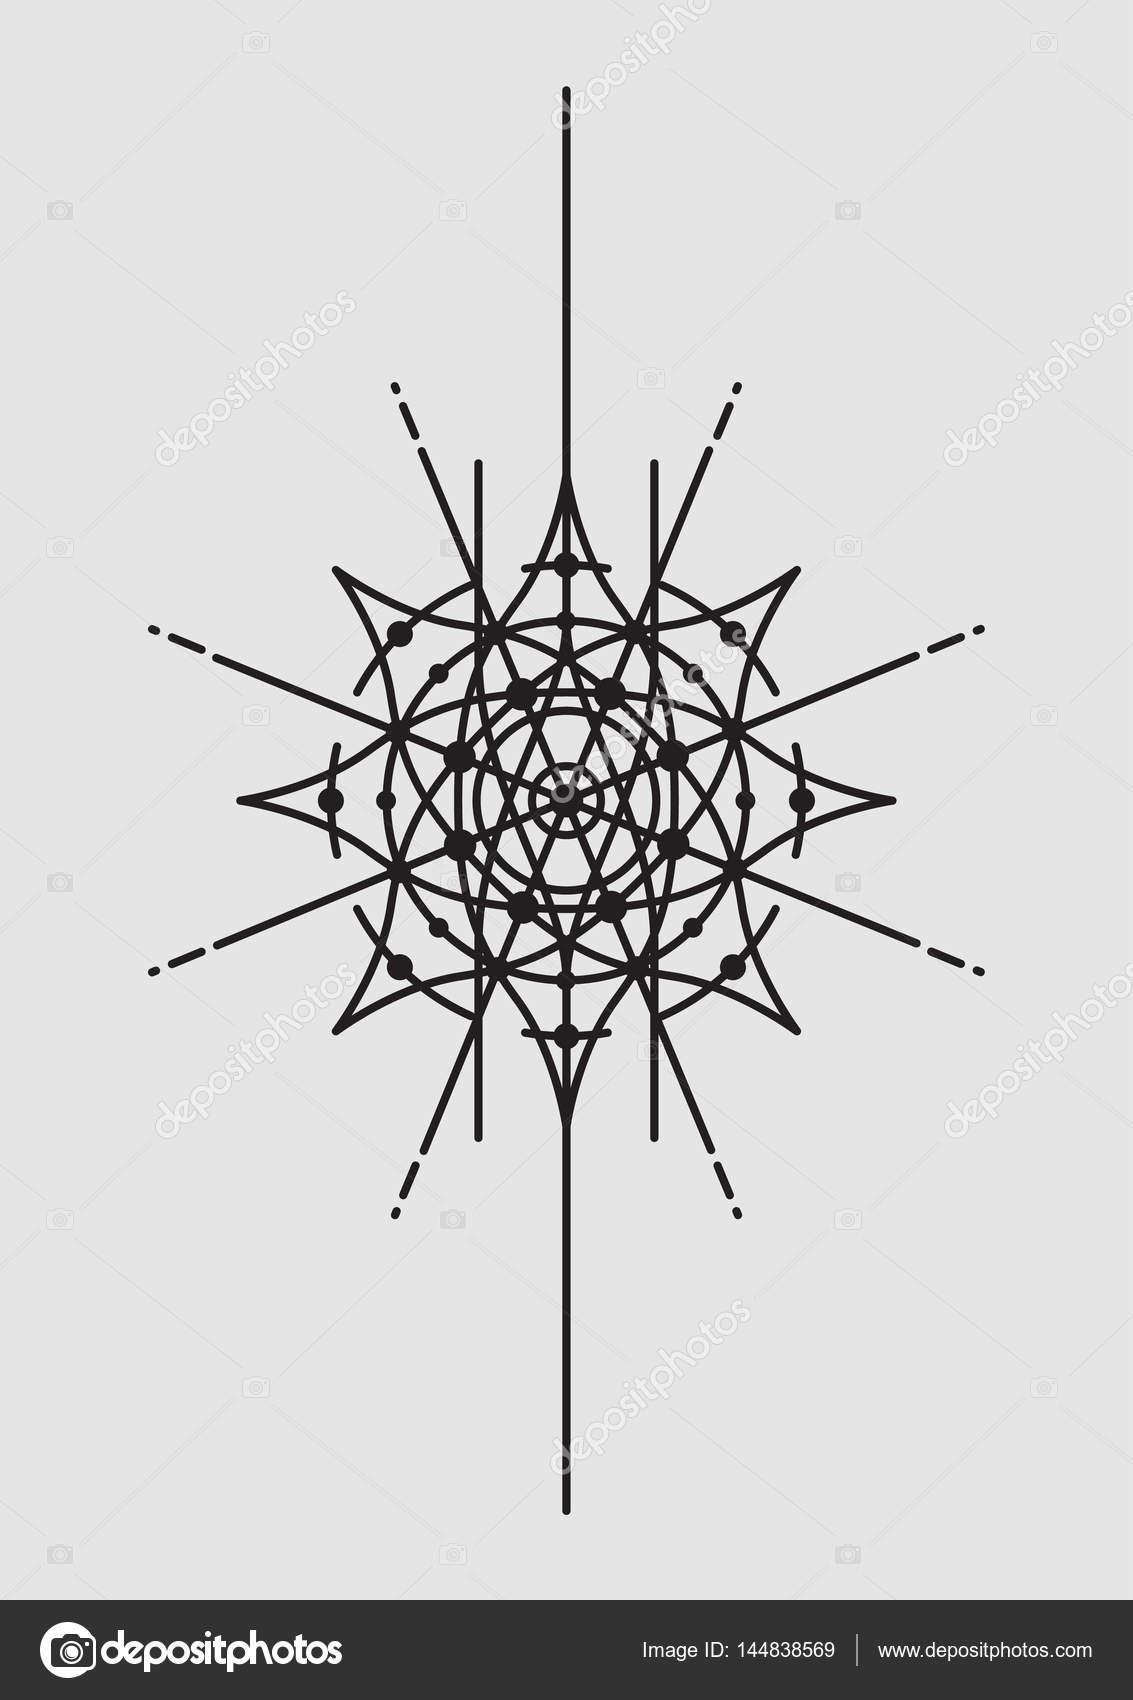 Abstract Geometric Vector Illustration, Mandala